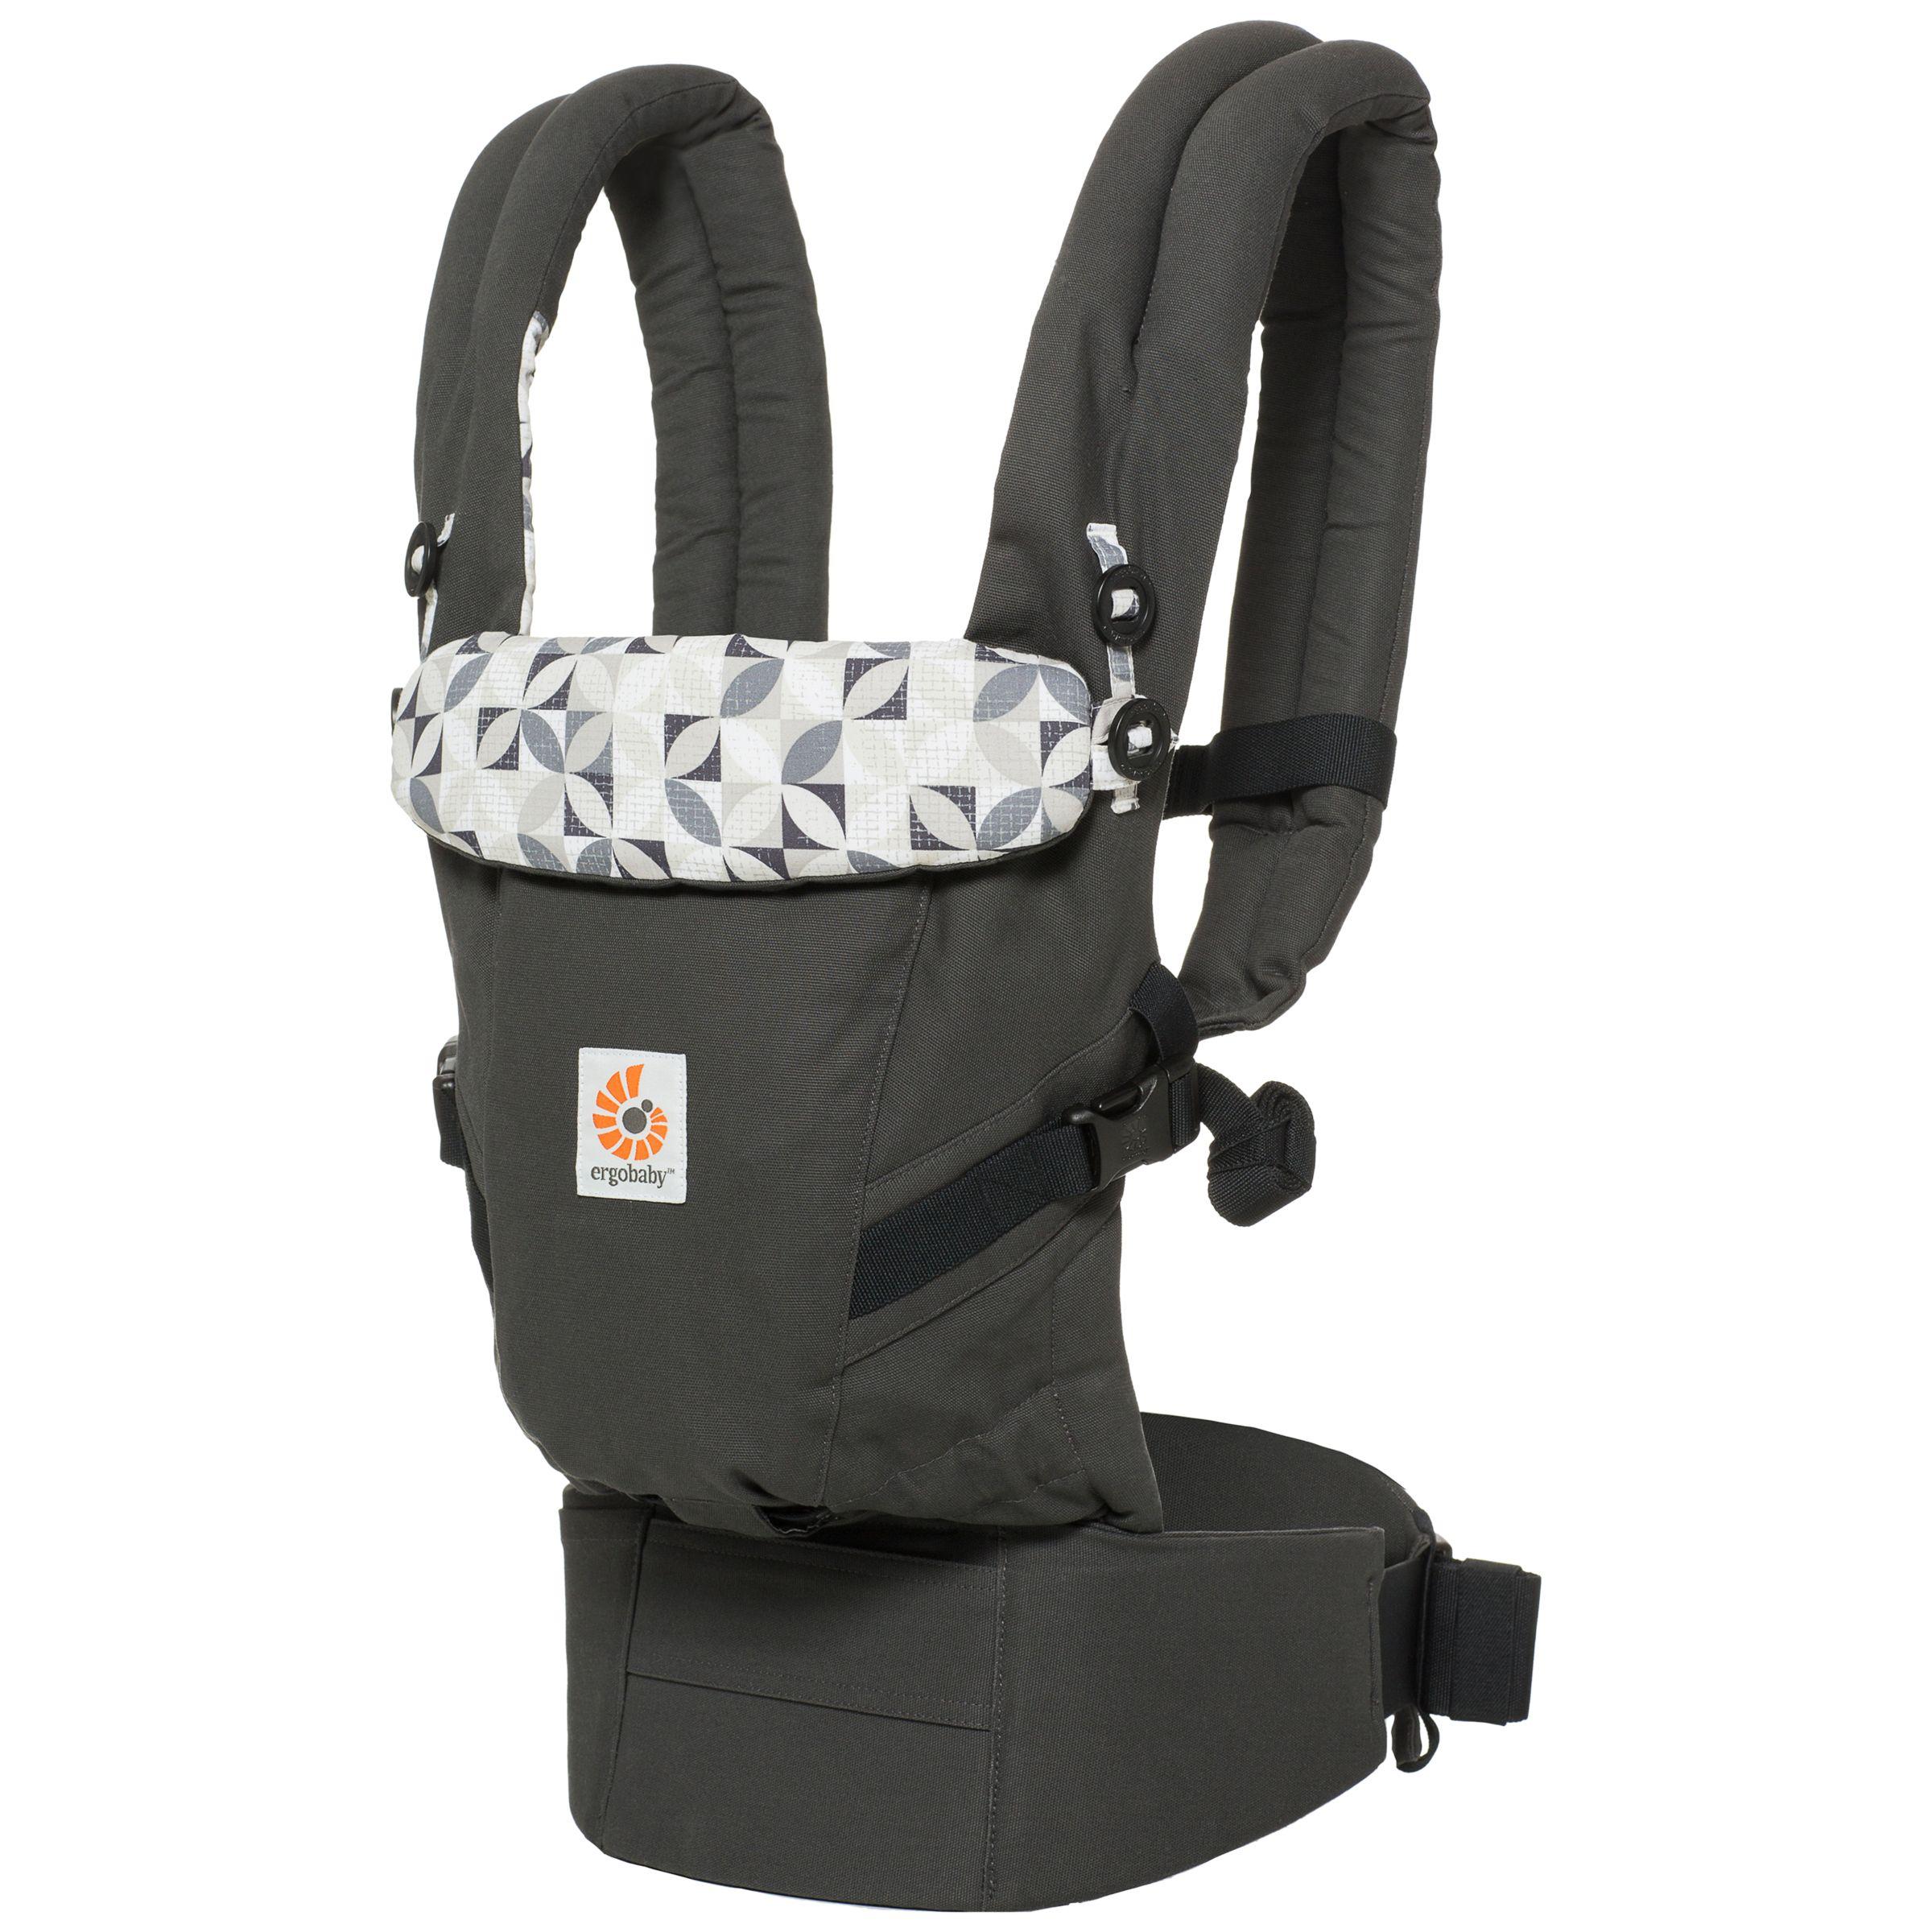 Ergobaby Adapt Baby Carrier Graphic Grey